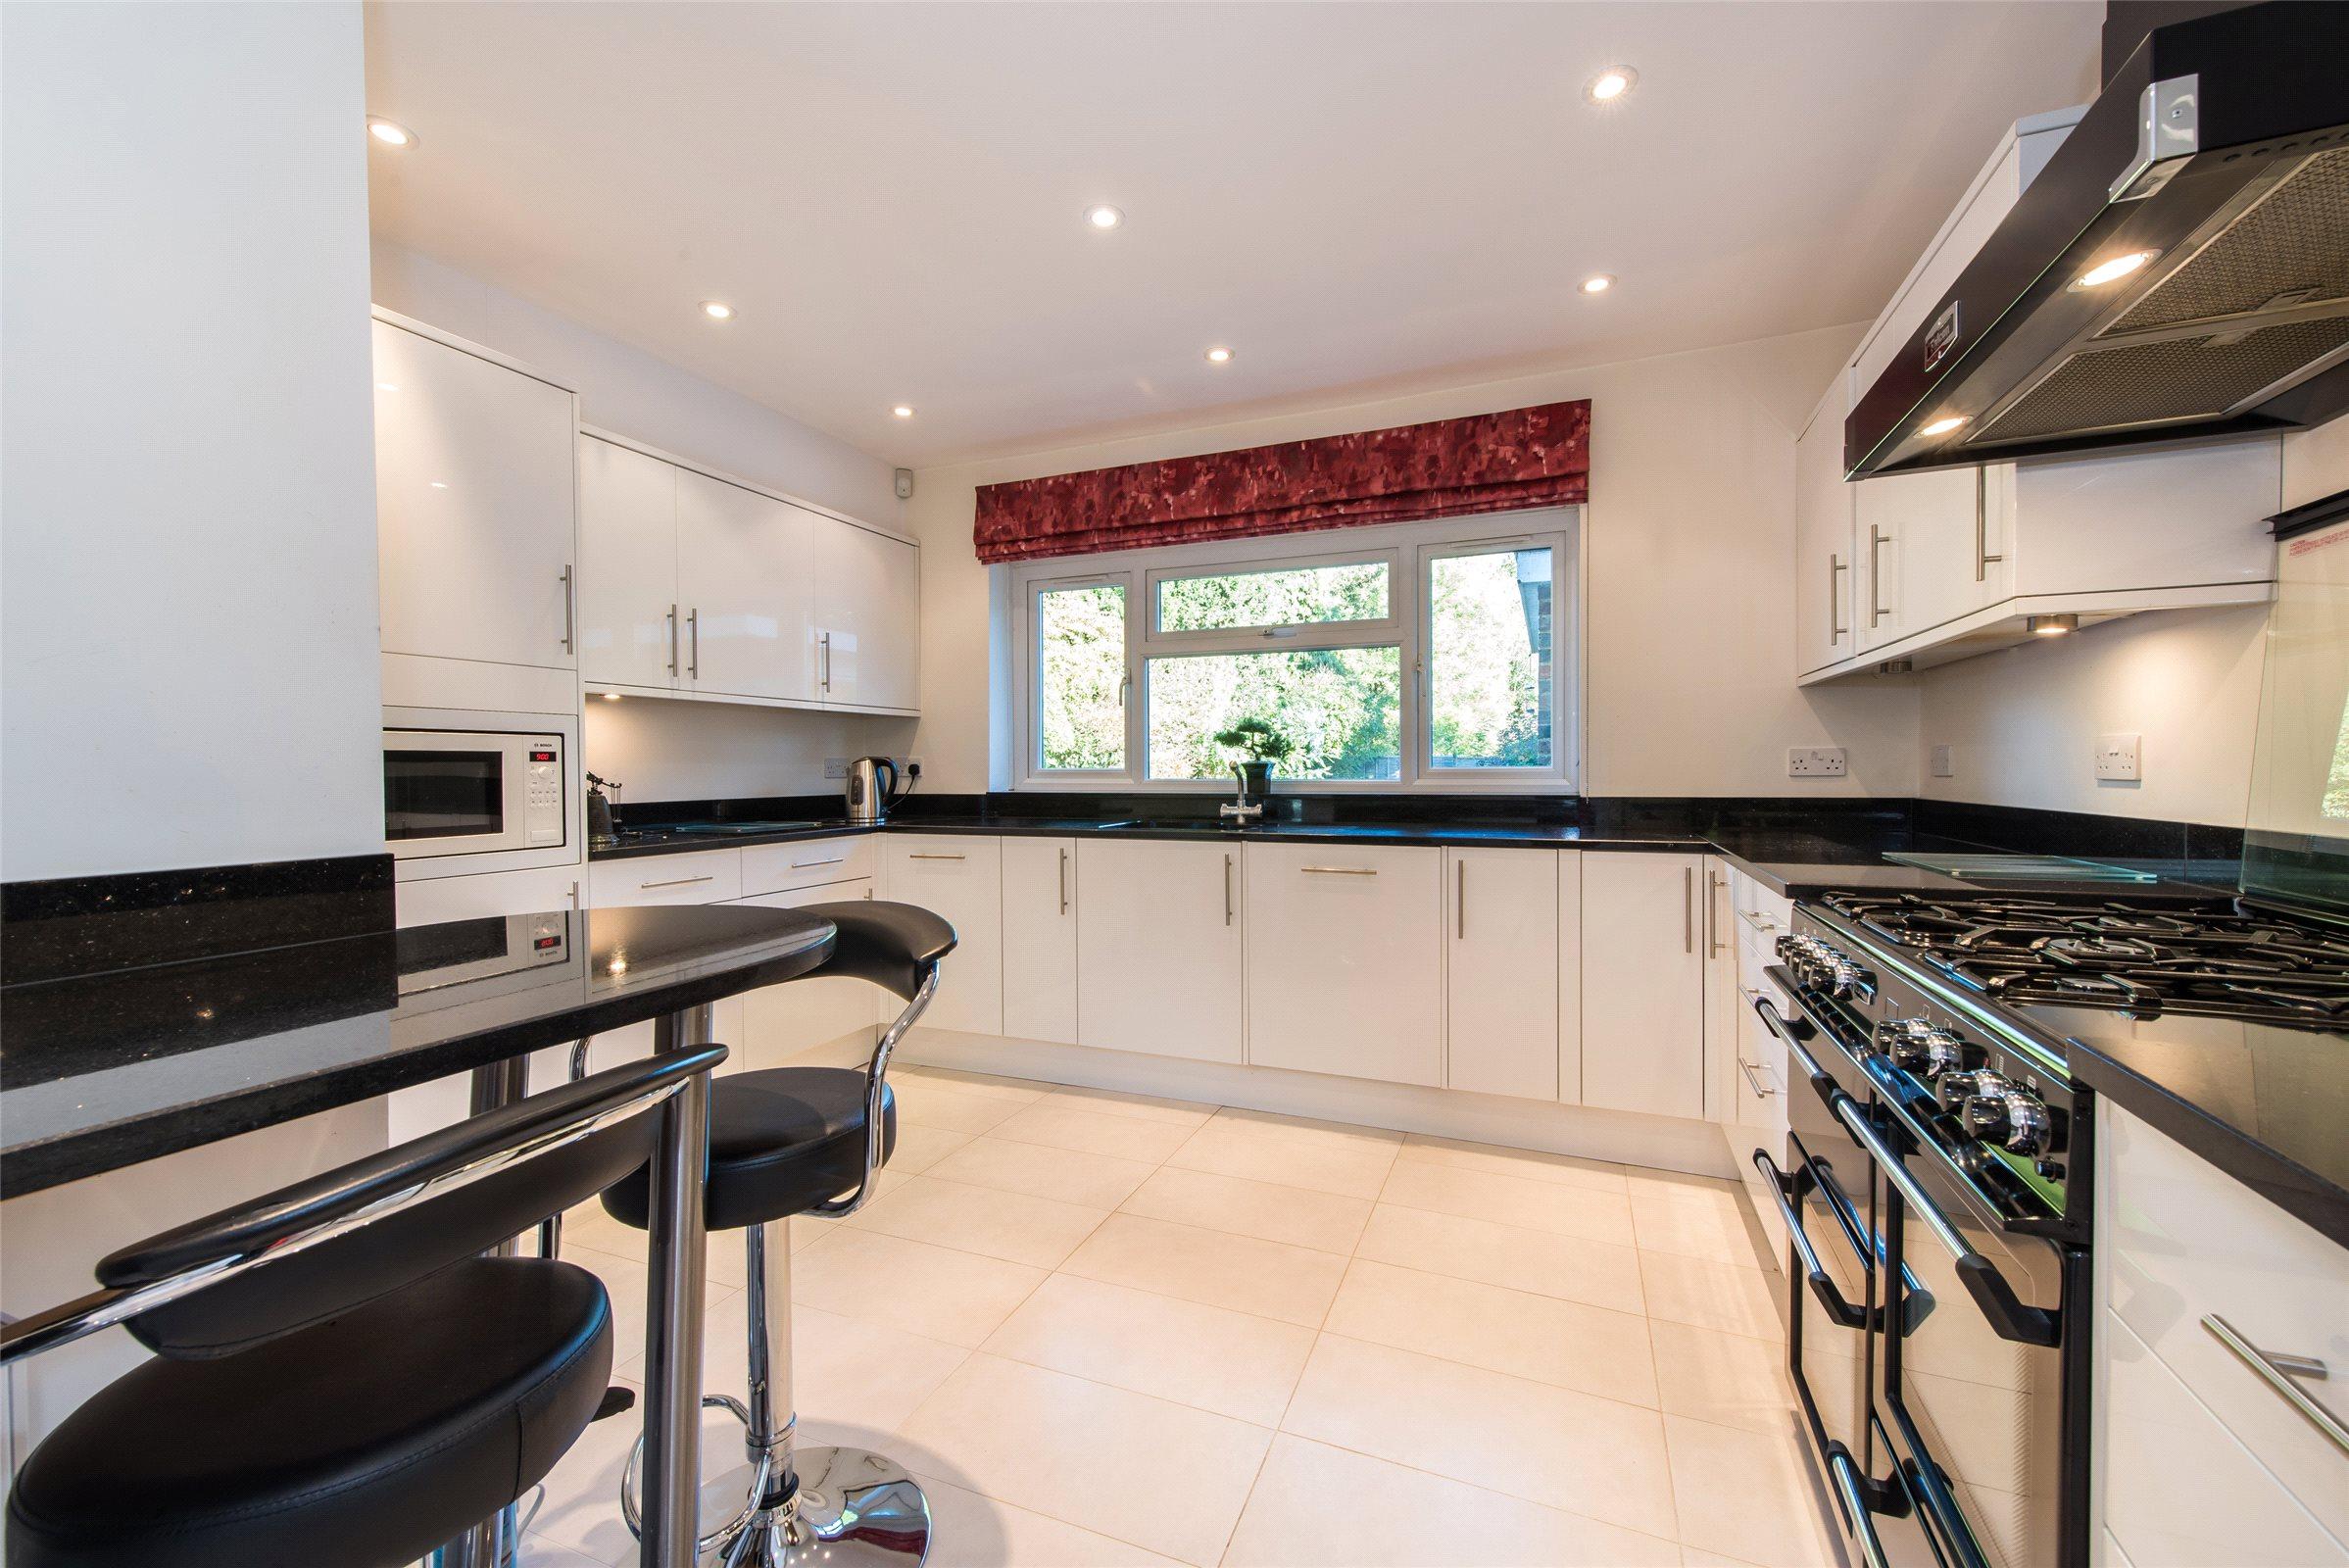 4 Bedrooms Detached House for sale in Park Lane East, Reigate, Surrey, RH2